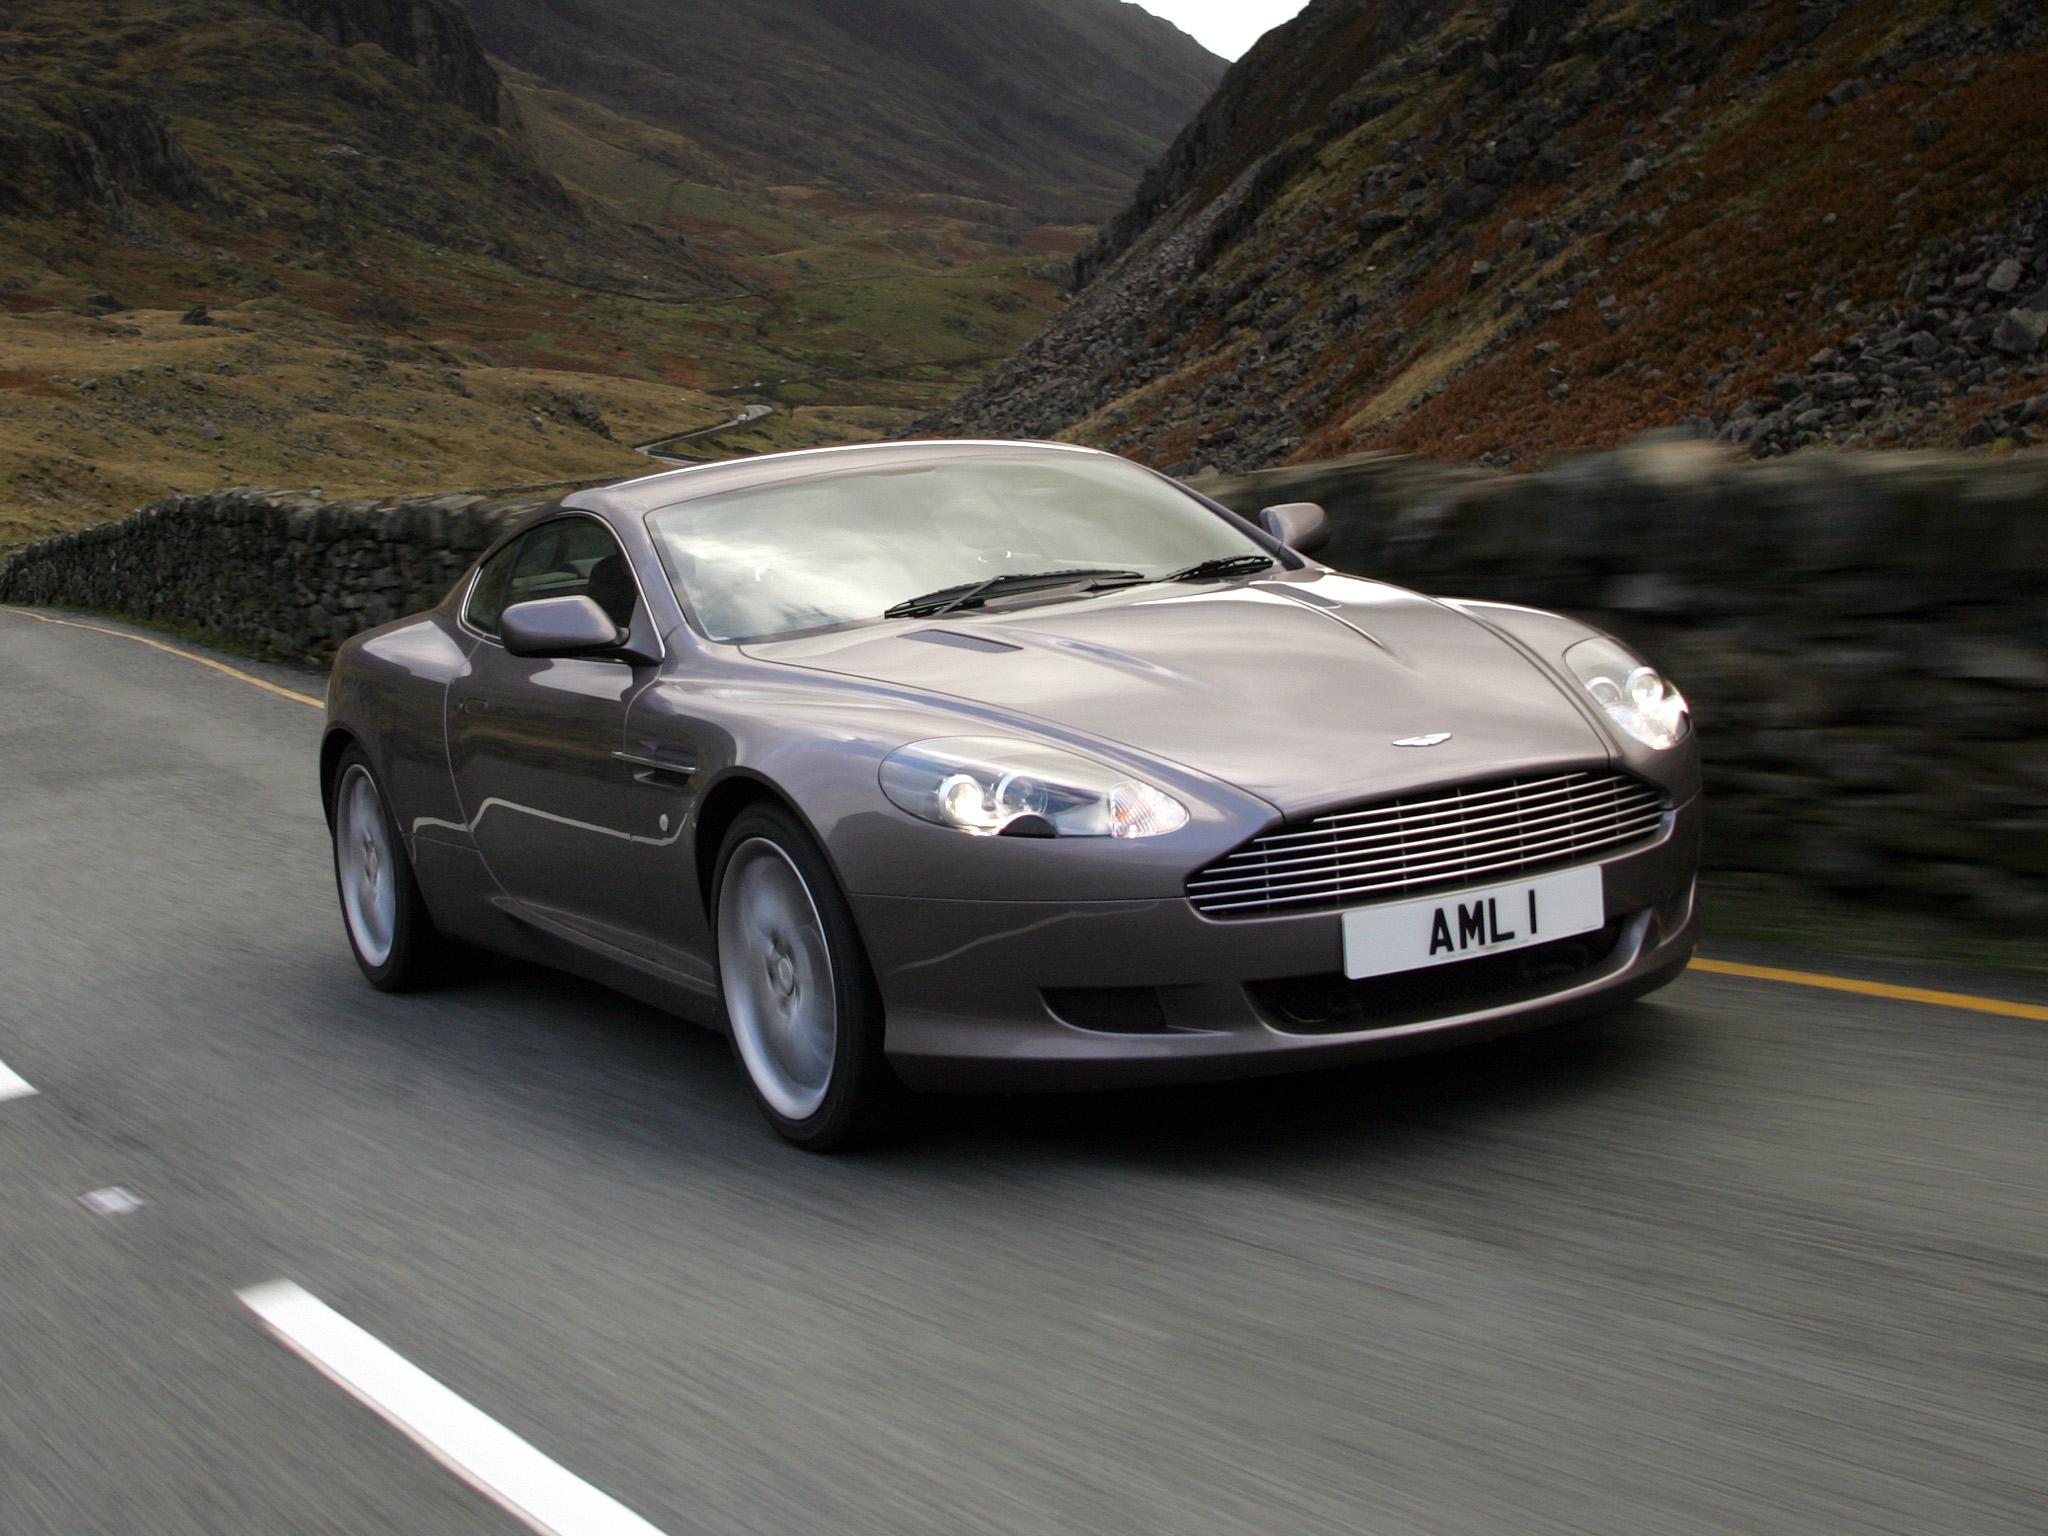 Aston Martin DB9 Wallpapers Car wallpapers HD 2048x1536